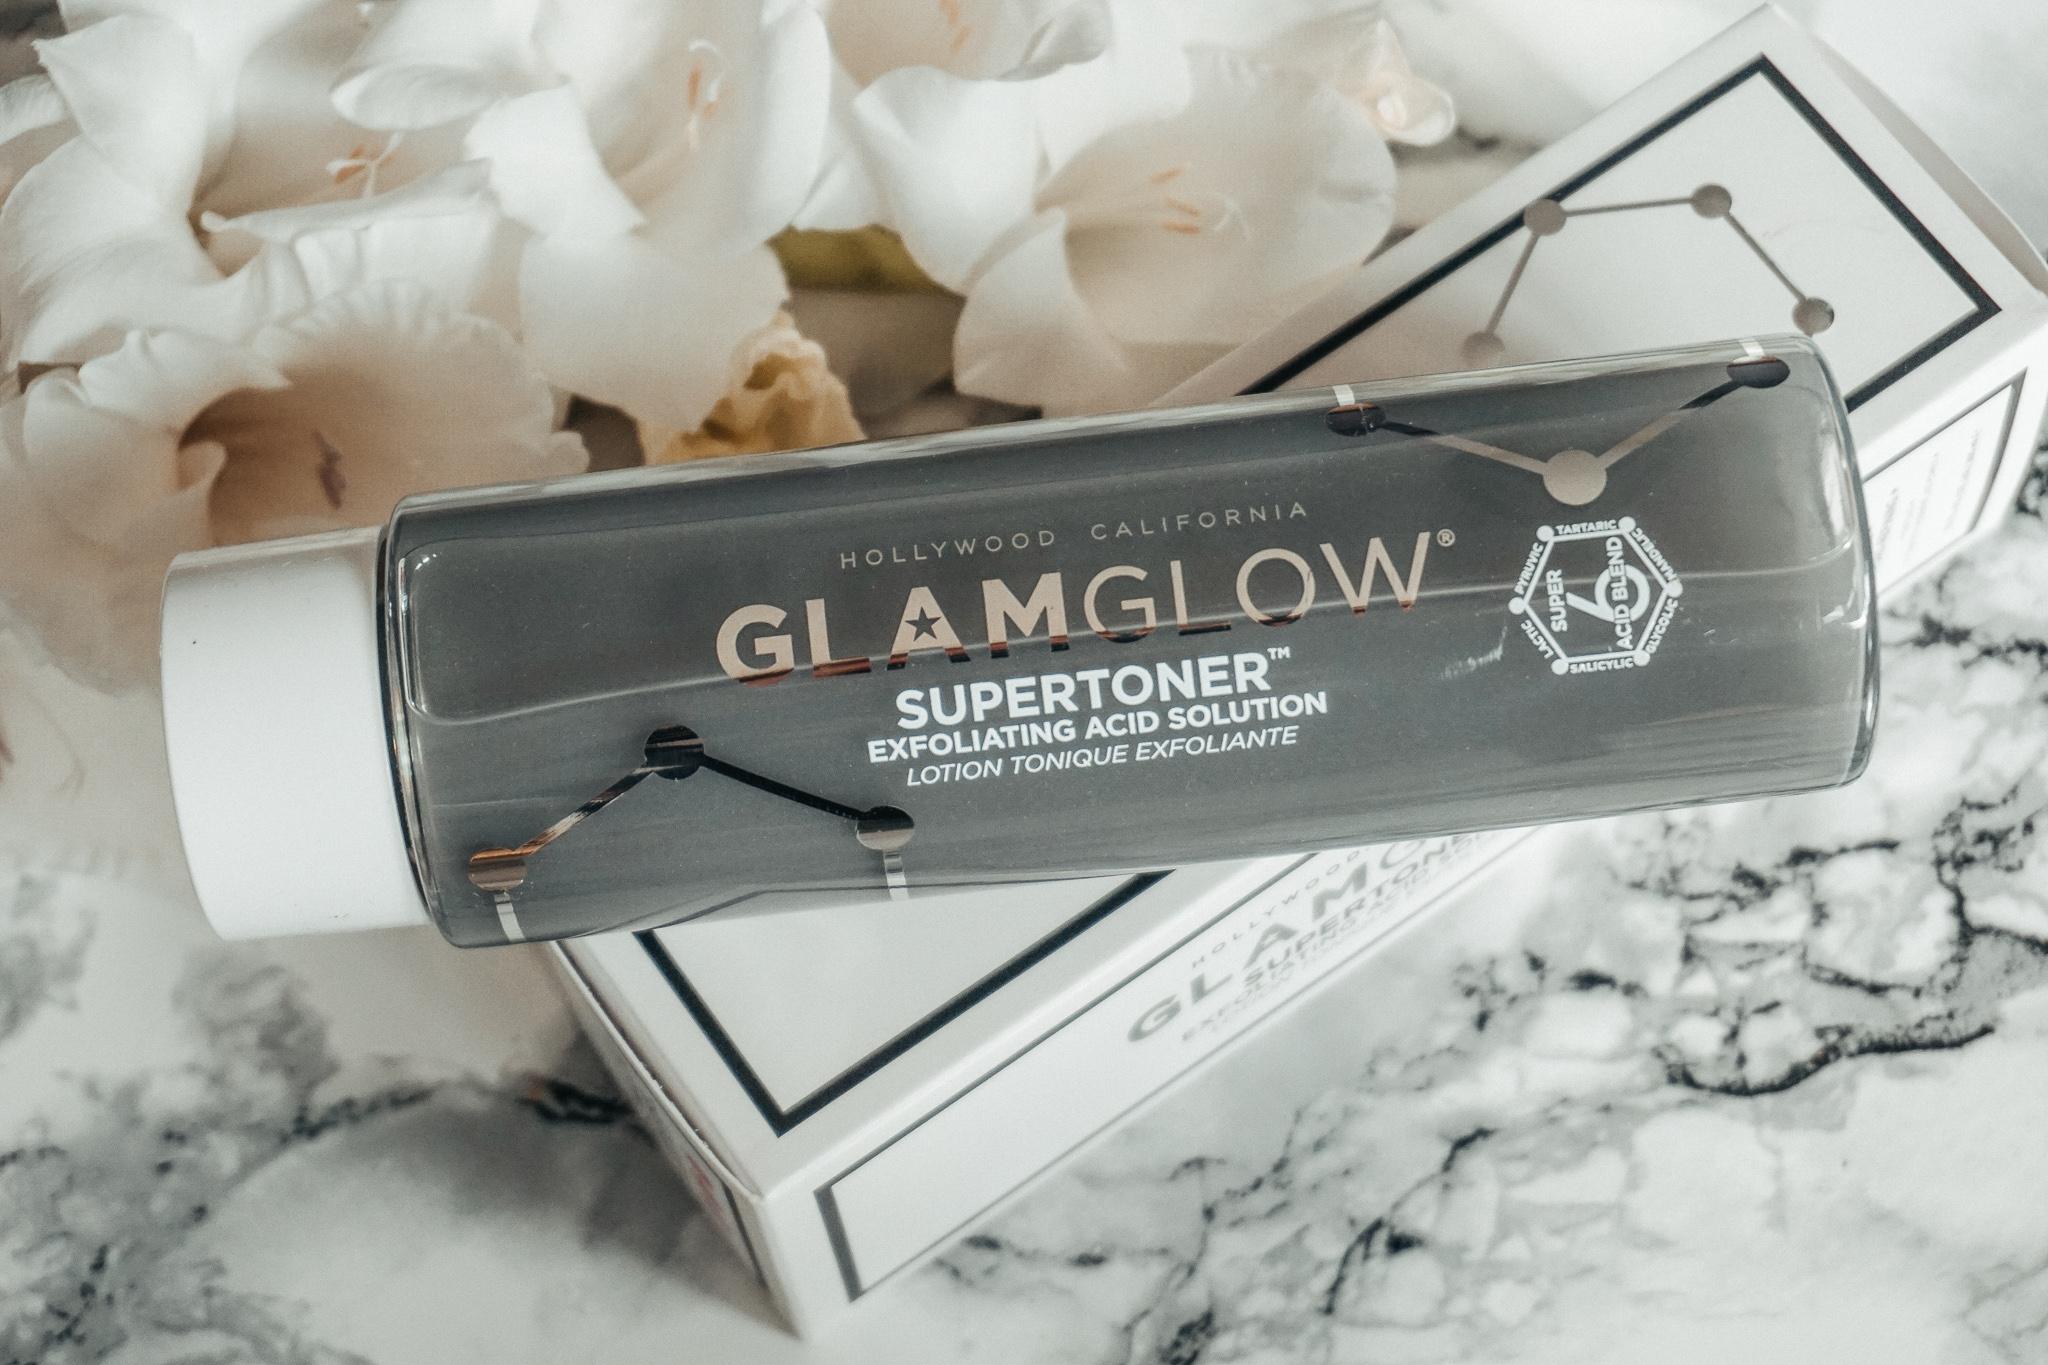 Glamglow - Supertoner